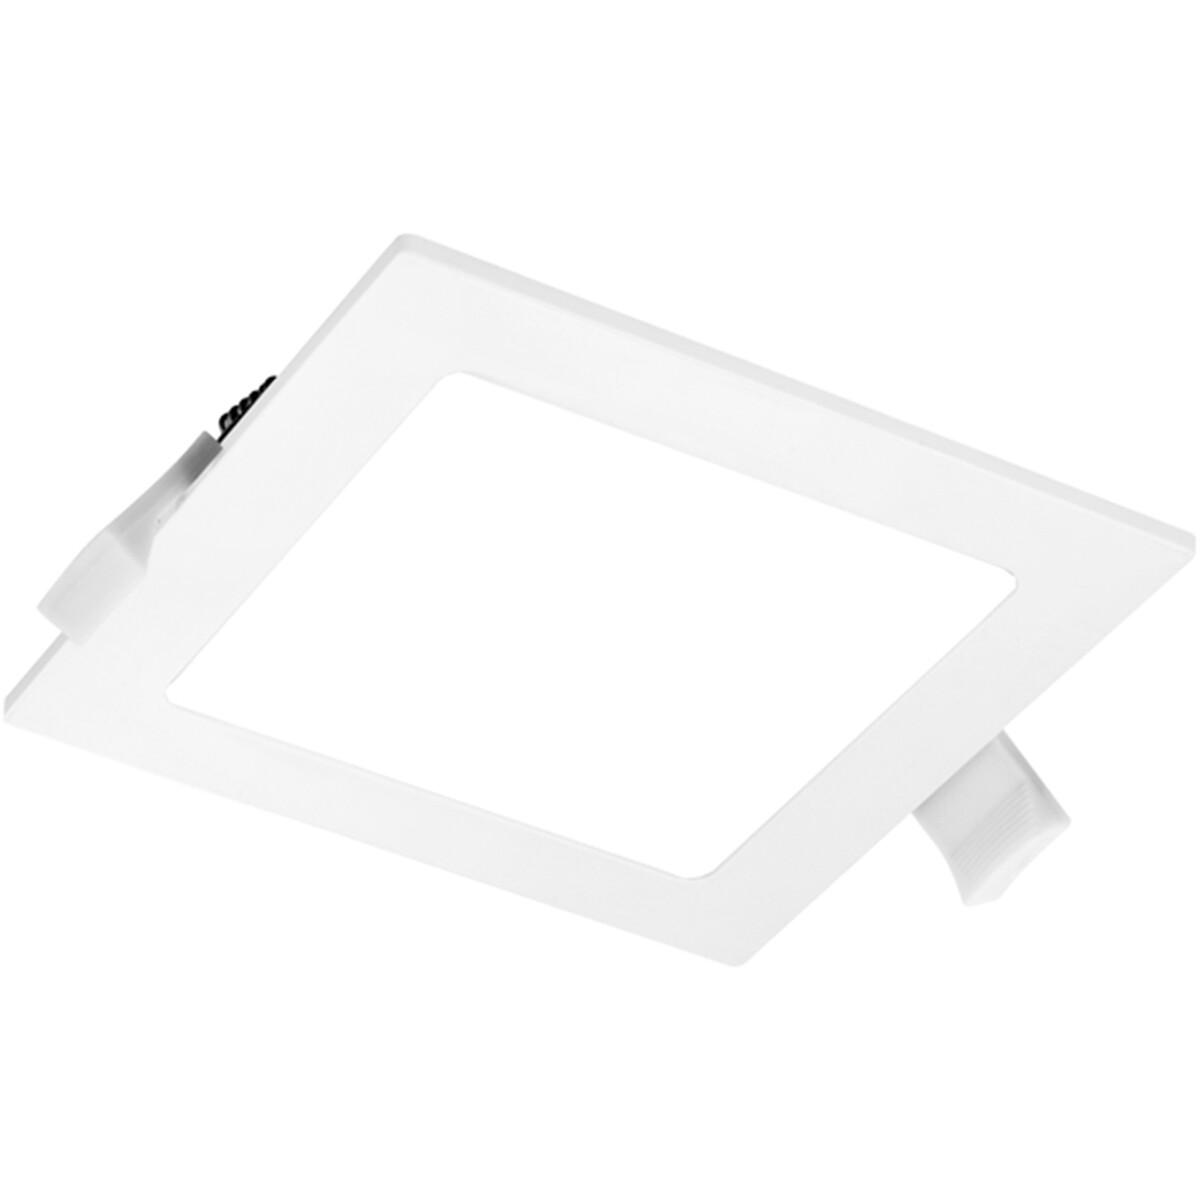 LED Downlight Slim Pro - Aigi Suno - Inbouw Vierkant 12W - Helder/Koud Wit 6000K - Mat Wit - Kunstst